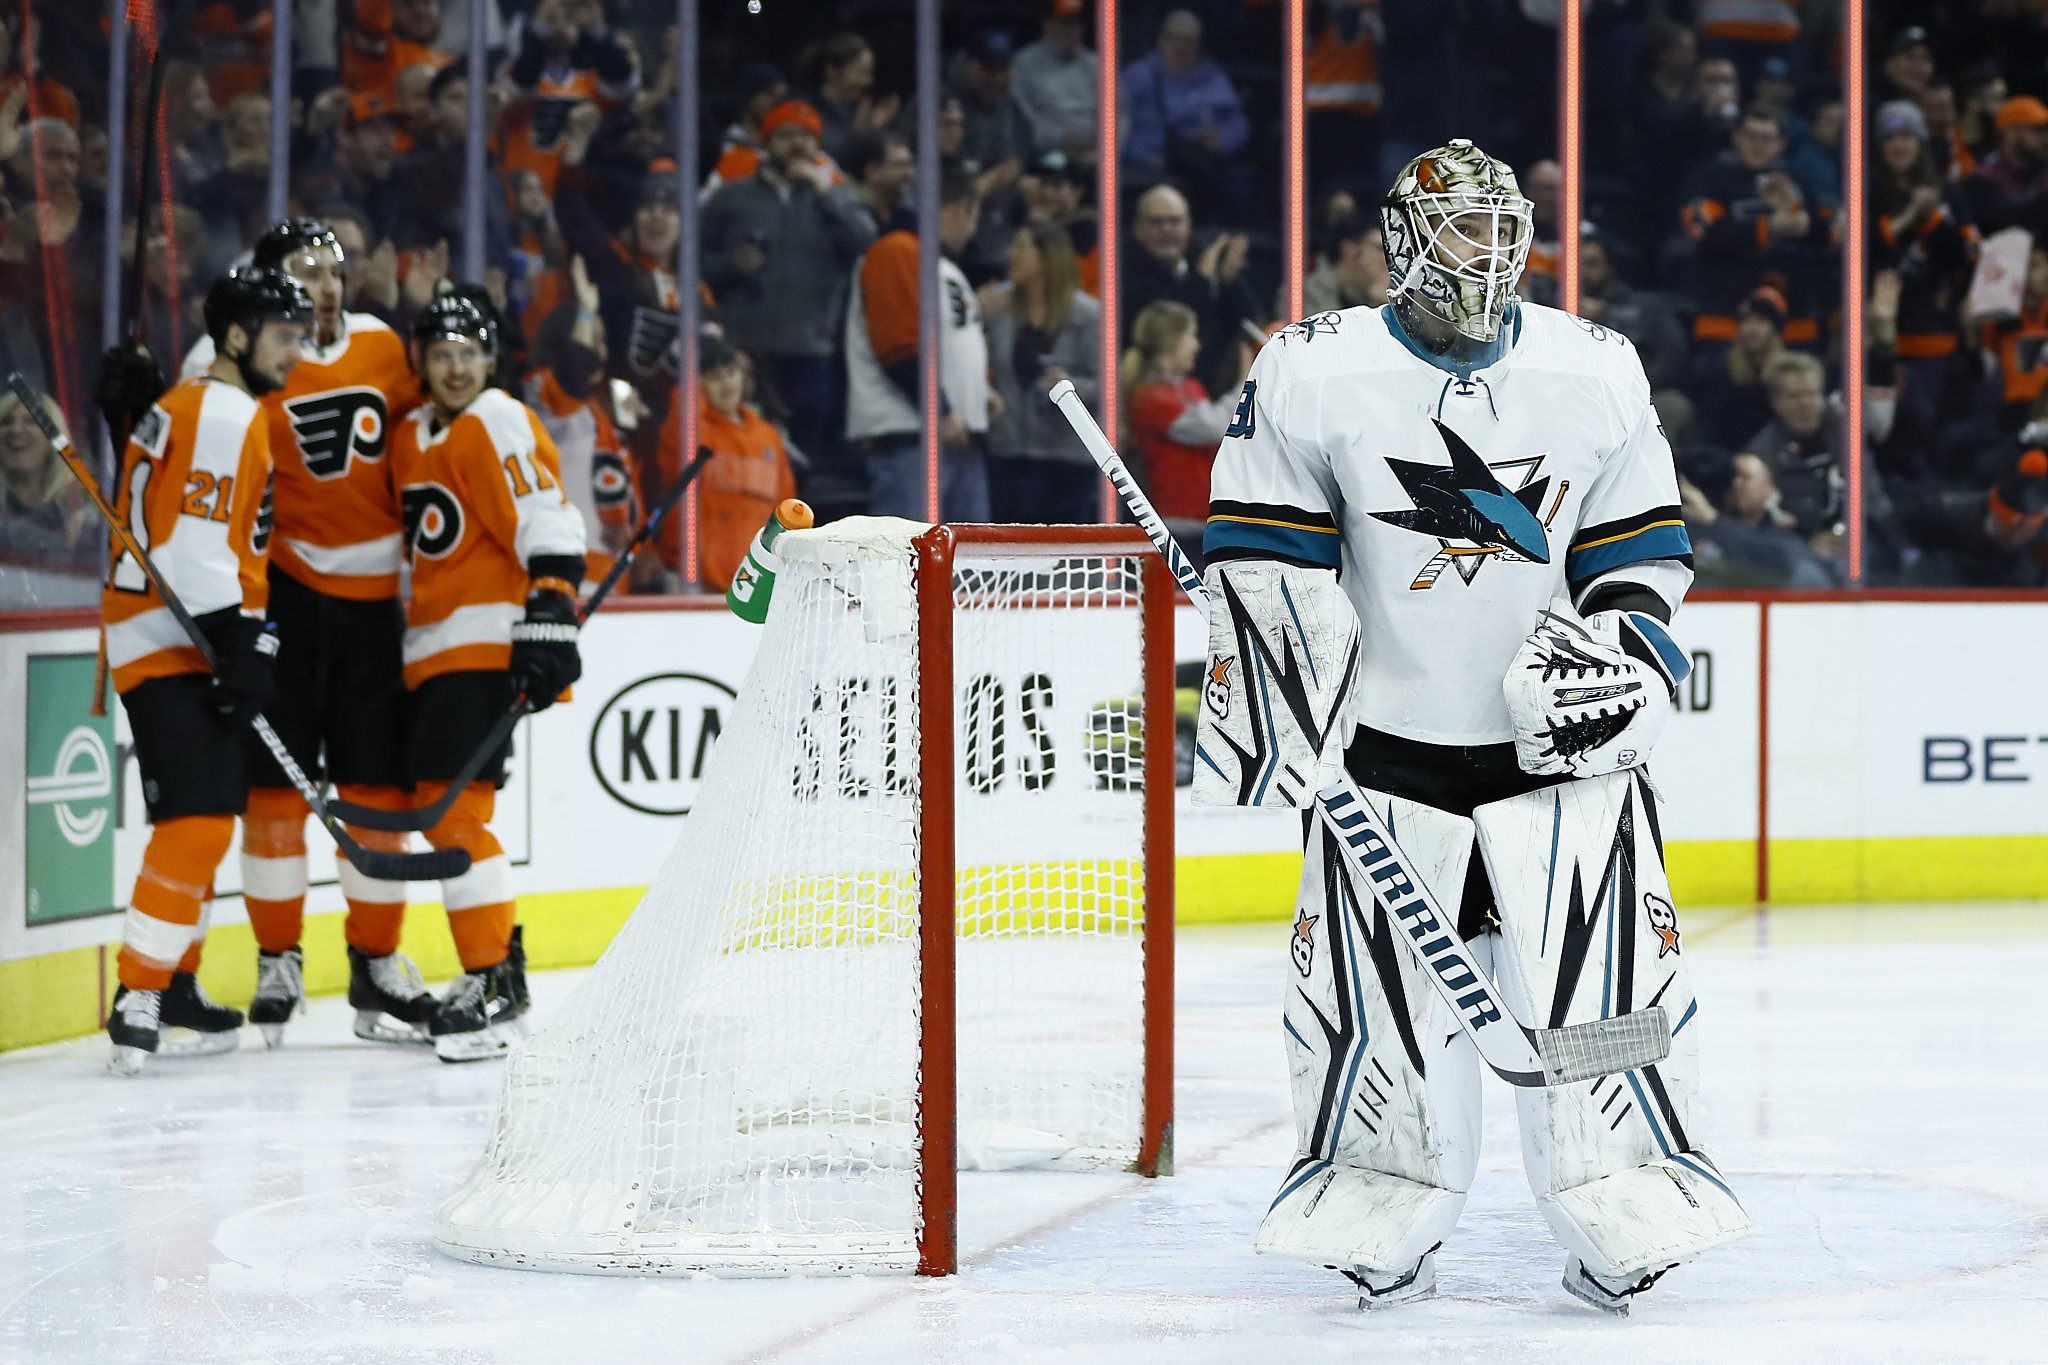 Flyers defeat Sharks despite Logan Couture's return